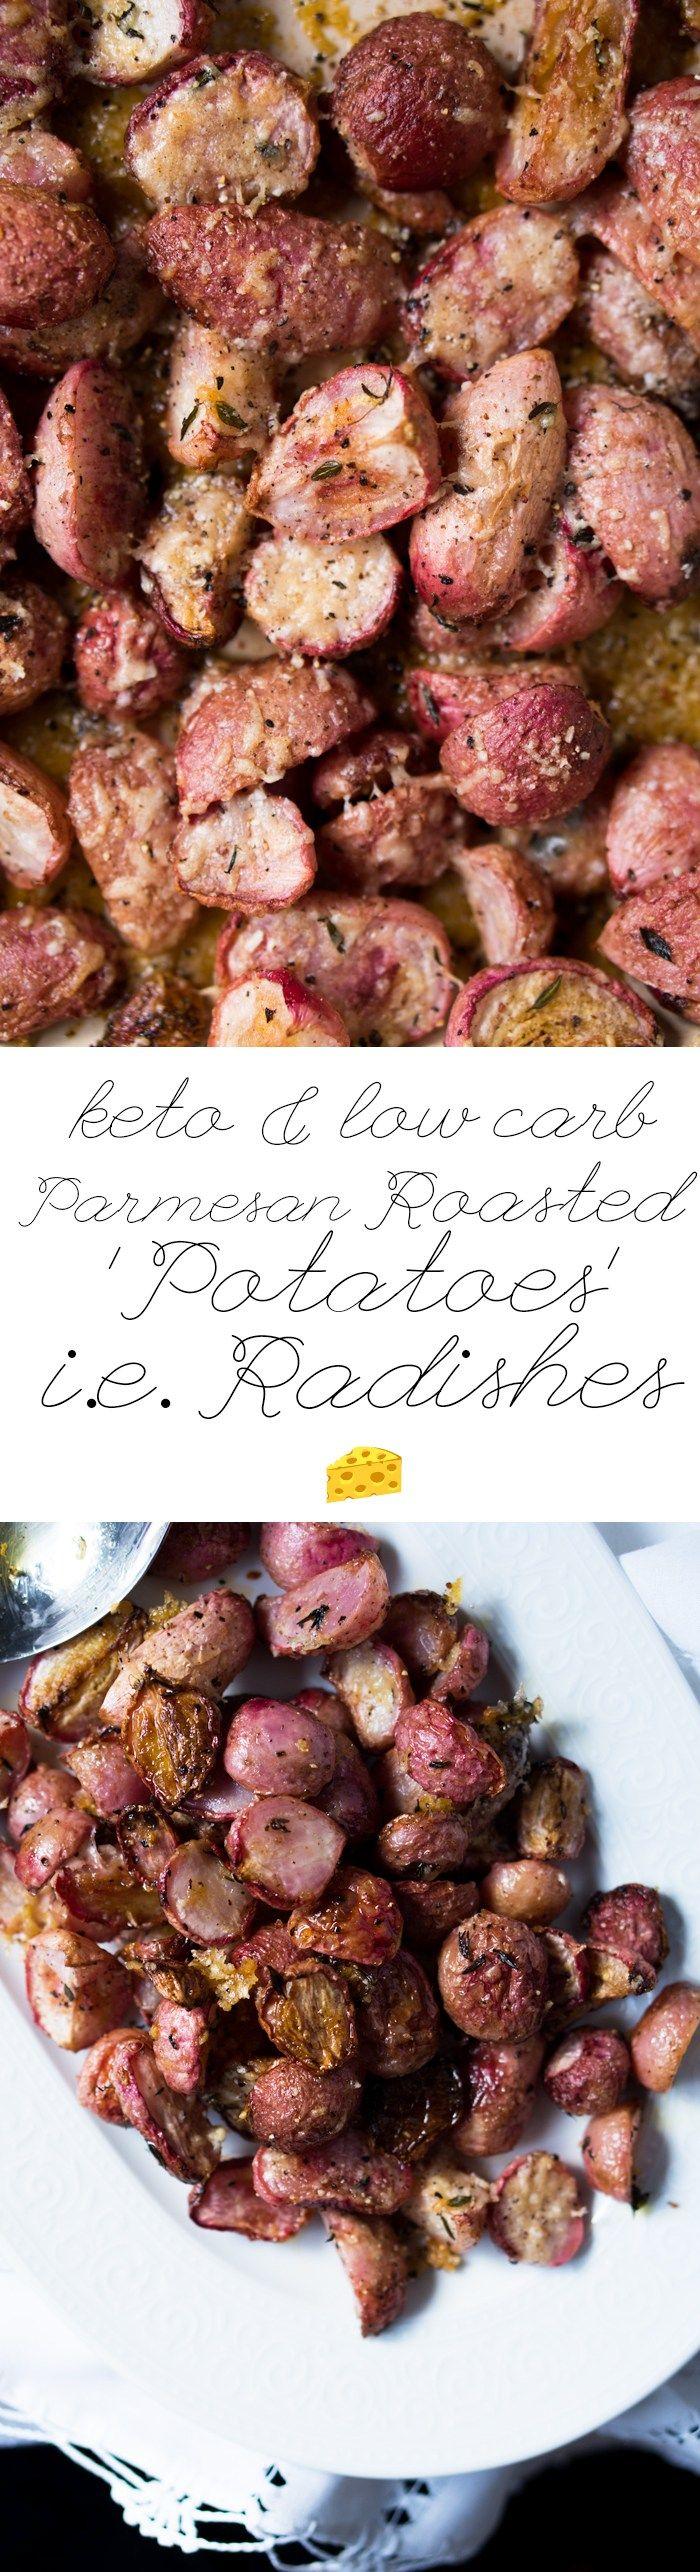 Low Carb & Keto Roasted Radishes; i.e. 'Potatoes'